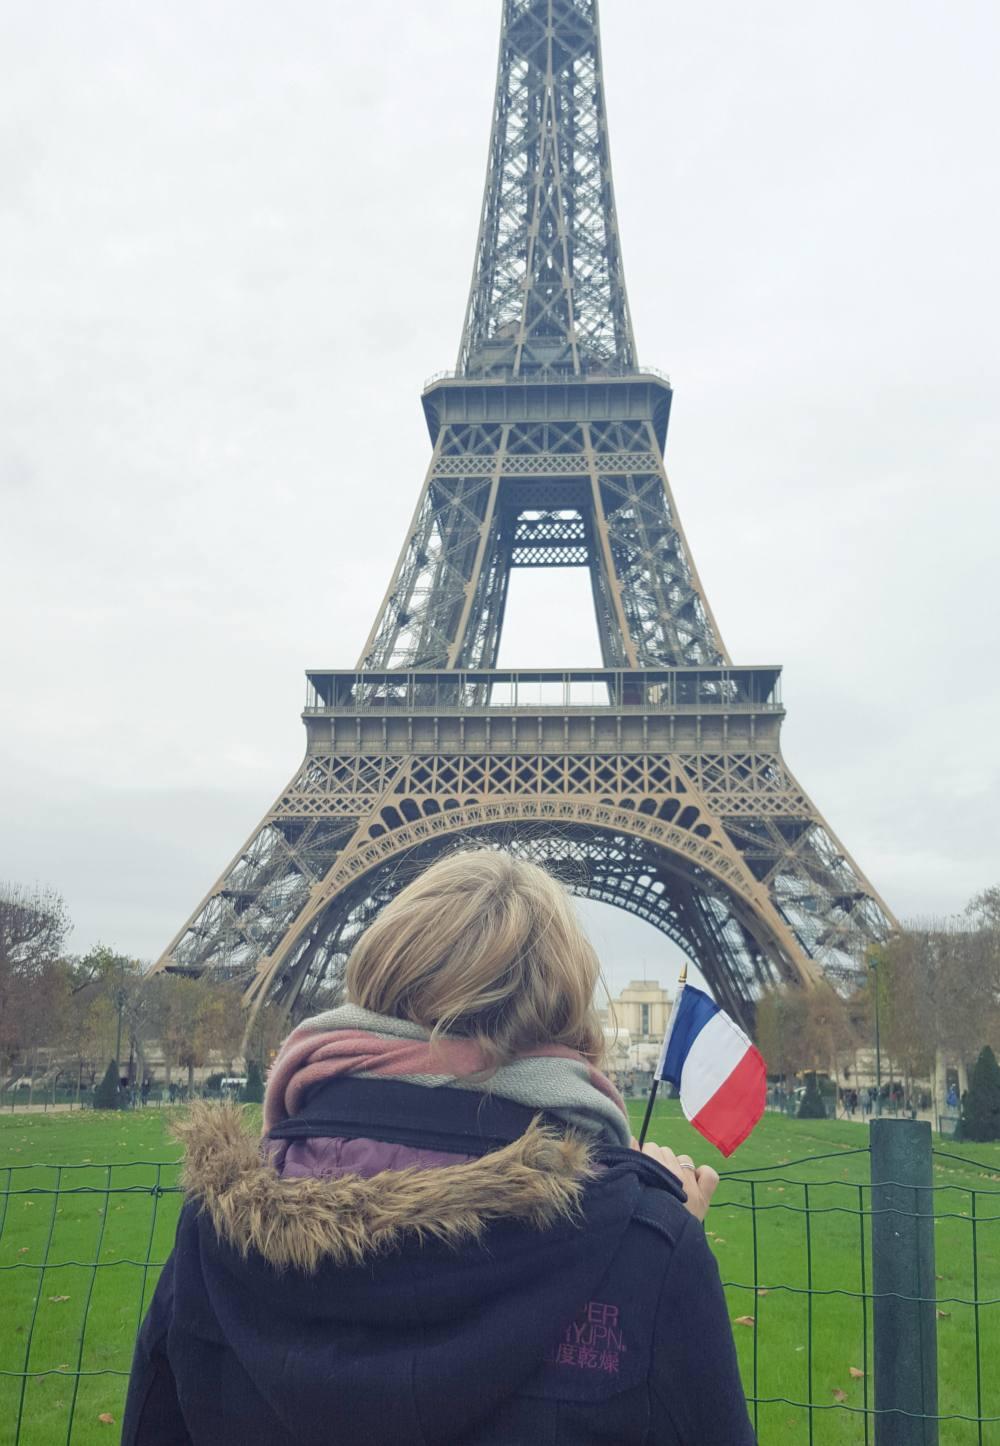 Terror attacks in Paris - The Eiffel Tower